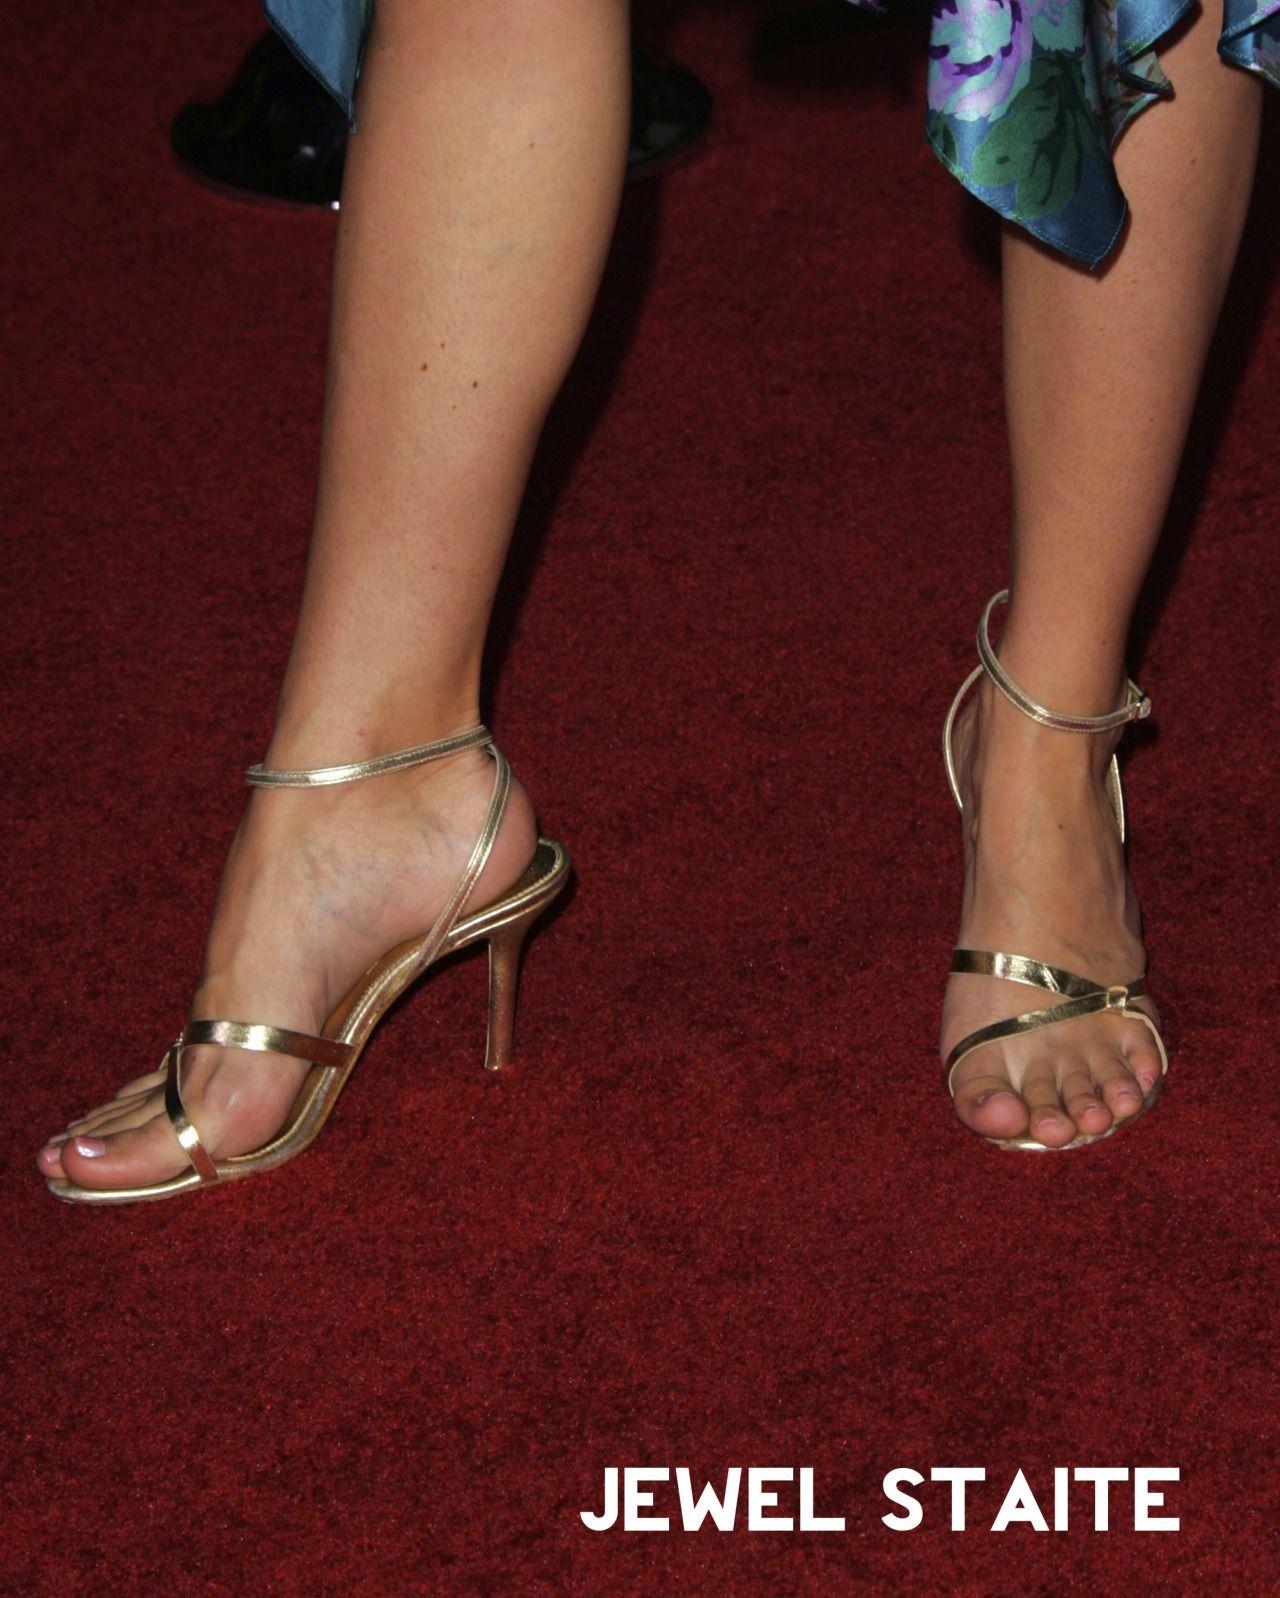 Feet Jewel Staite nude (79 photo), Pussy, Cleavage, Twitter, legs 2020